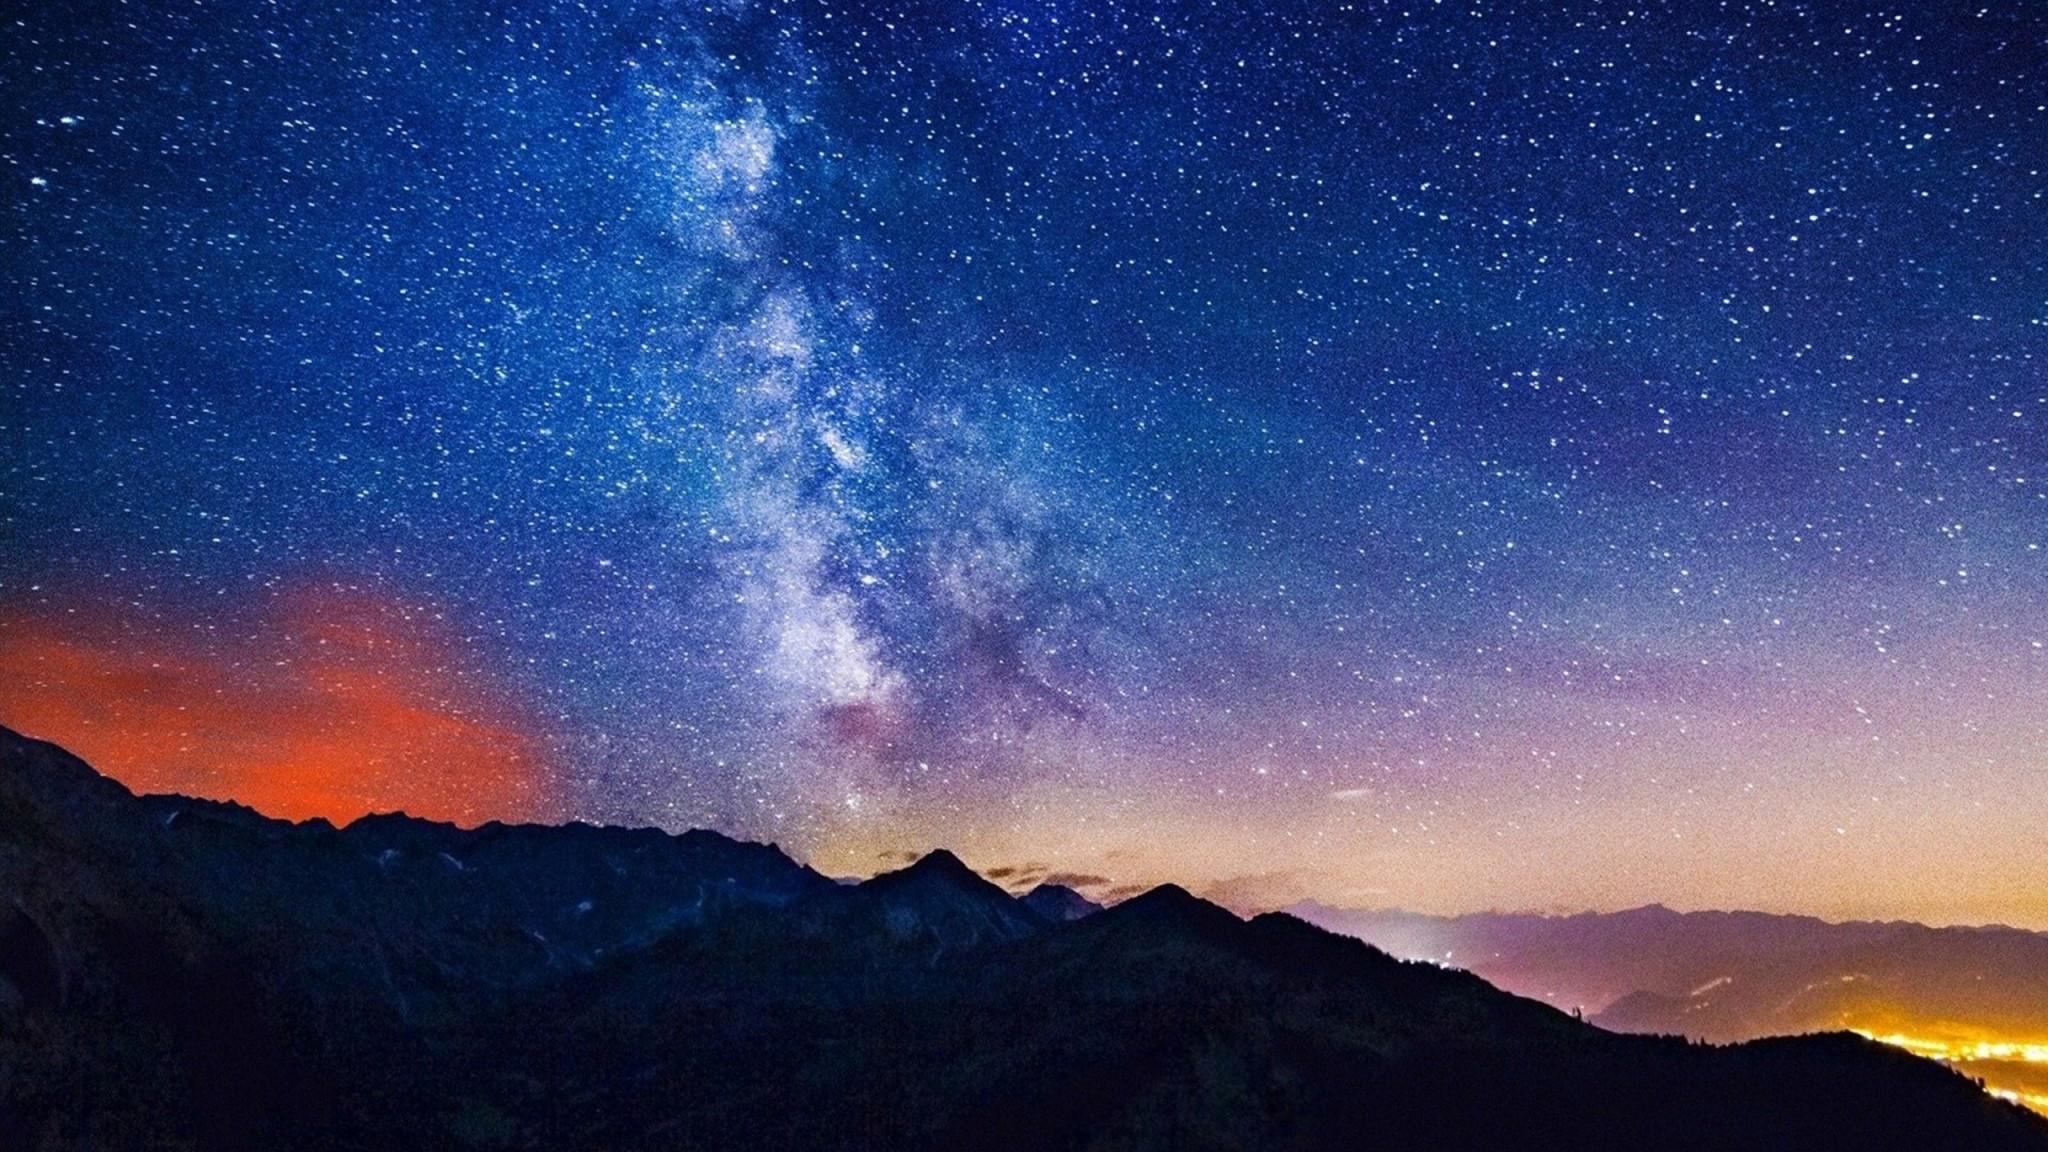 night sky beautiful wallpaper desktop